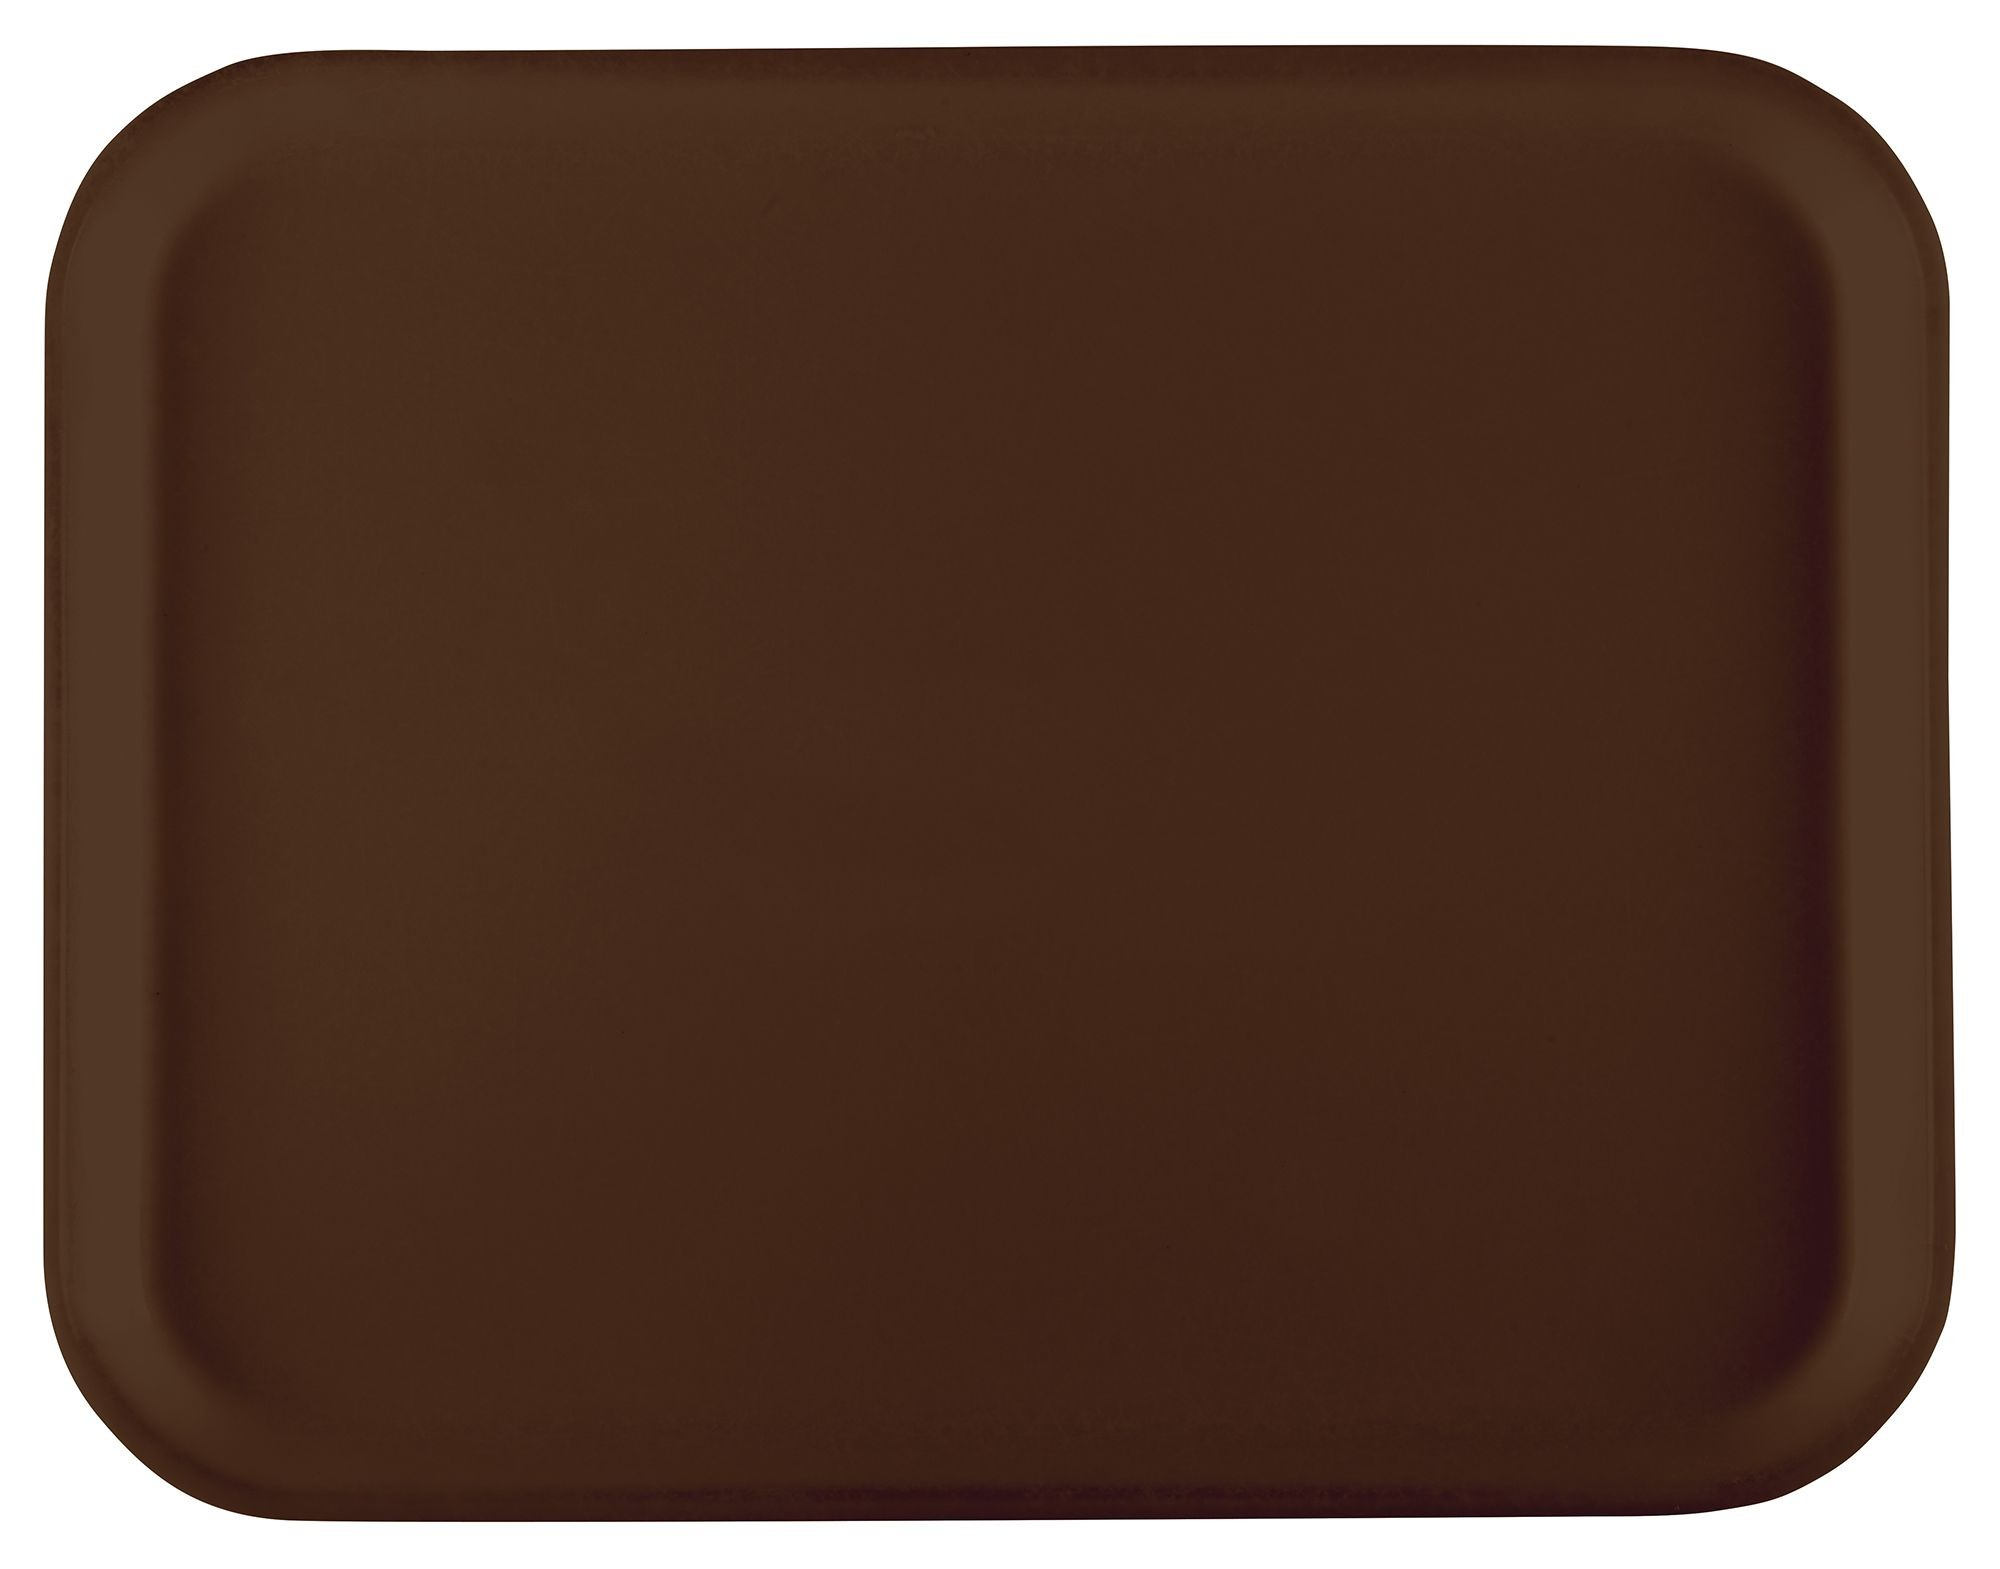 Winco fgt-1216b Fiberglass Rectangular Tray, Brown, 12''x 16''